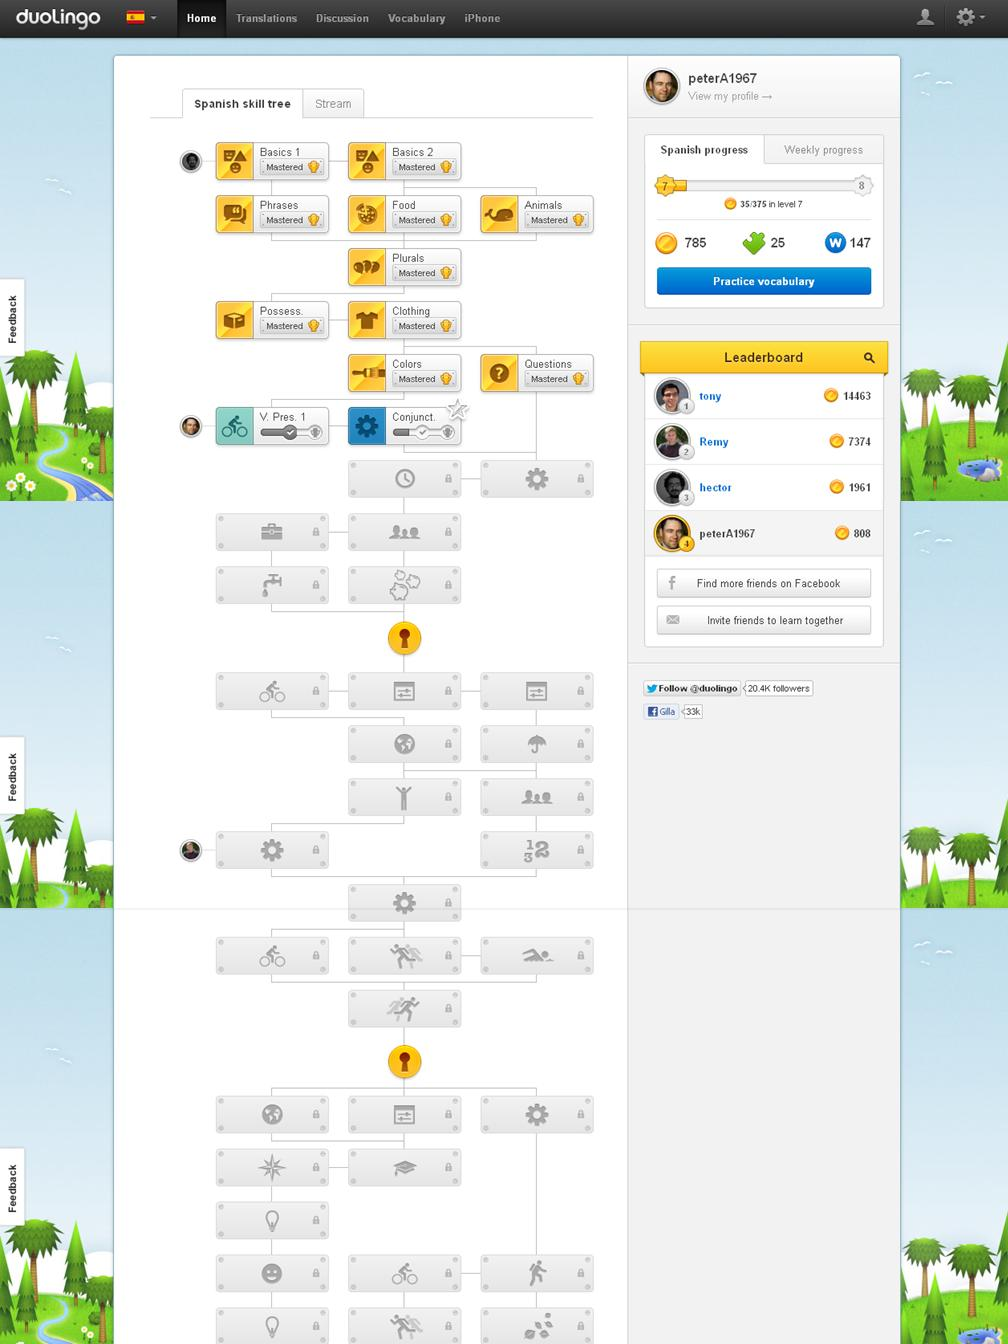 Duolingo status board